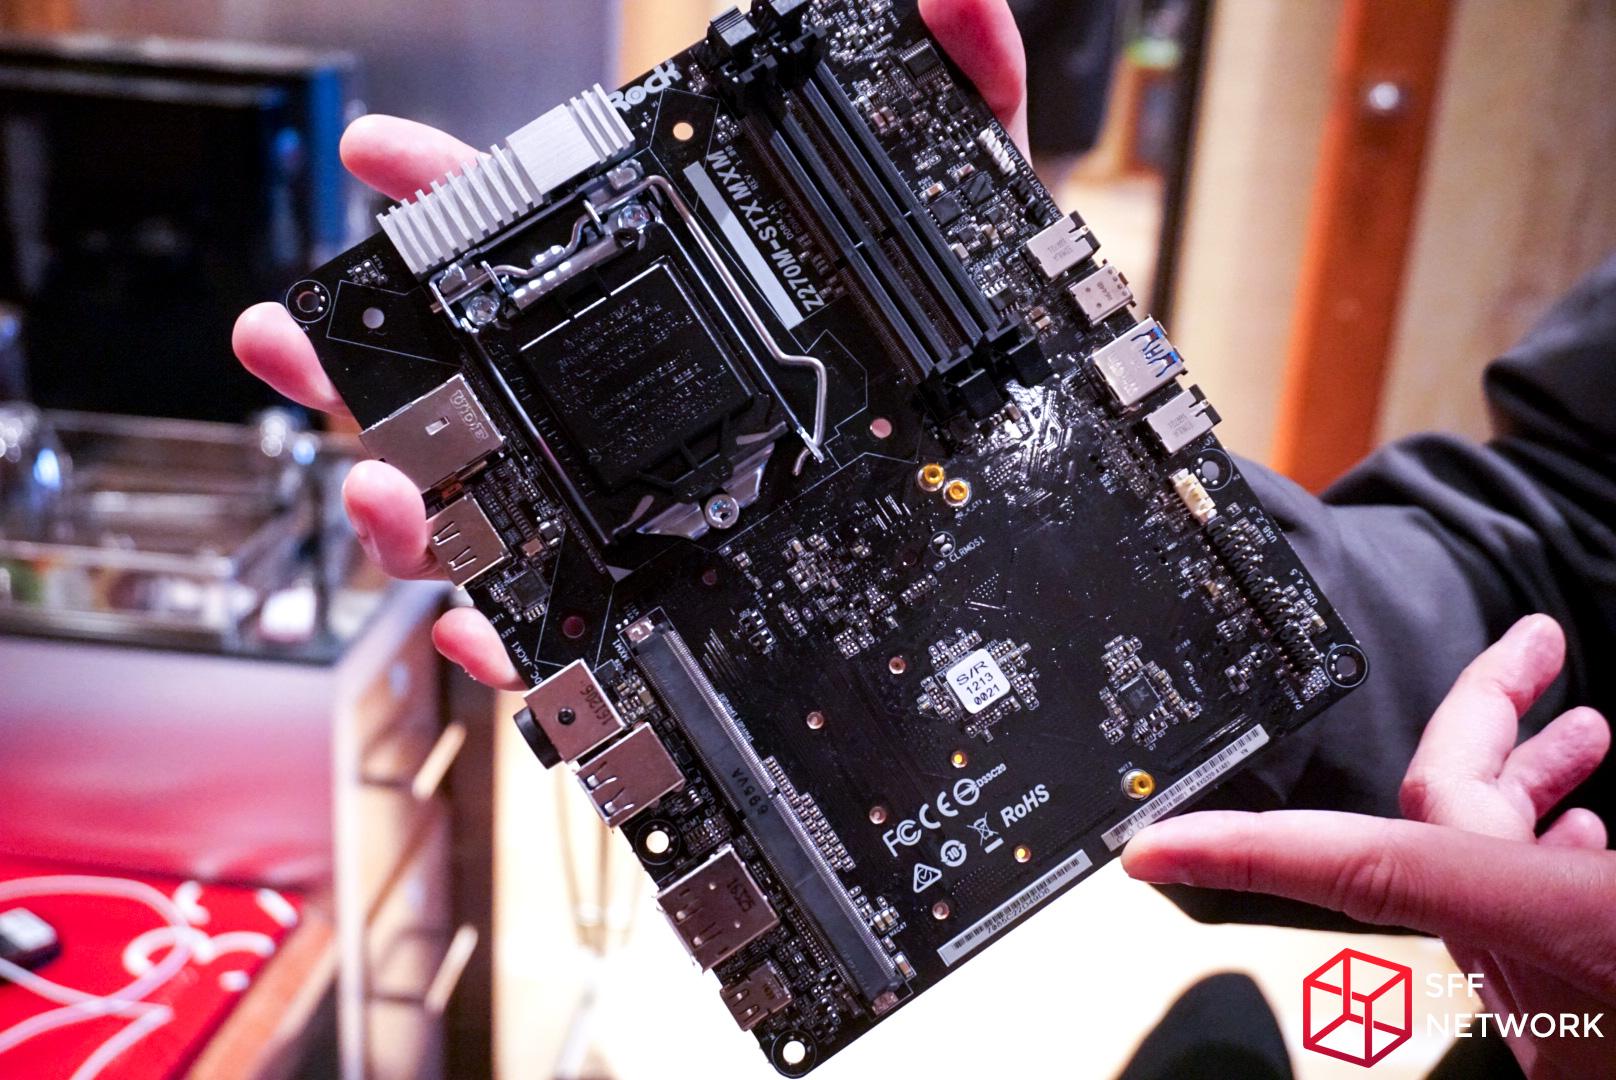 ASRock Shows DeskMini GTX/RX, using Micro-STX Motherboard with MXM